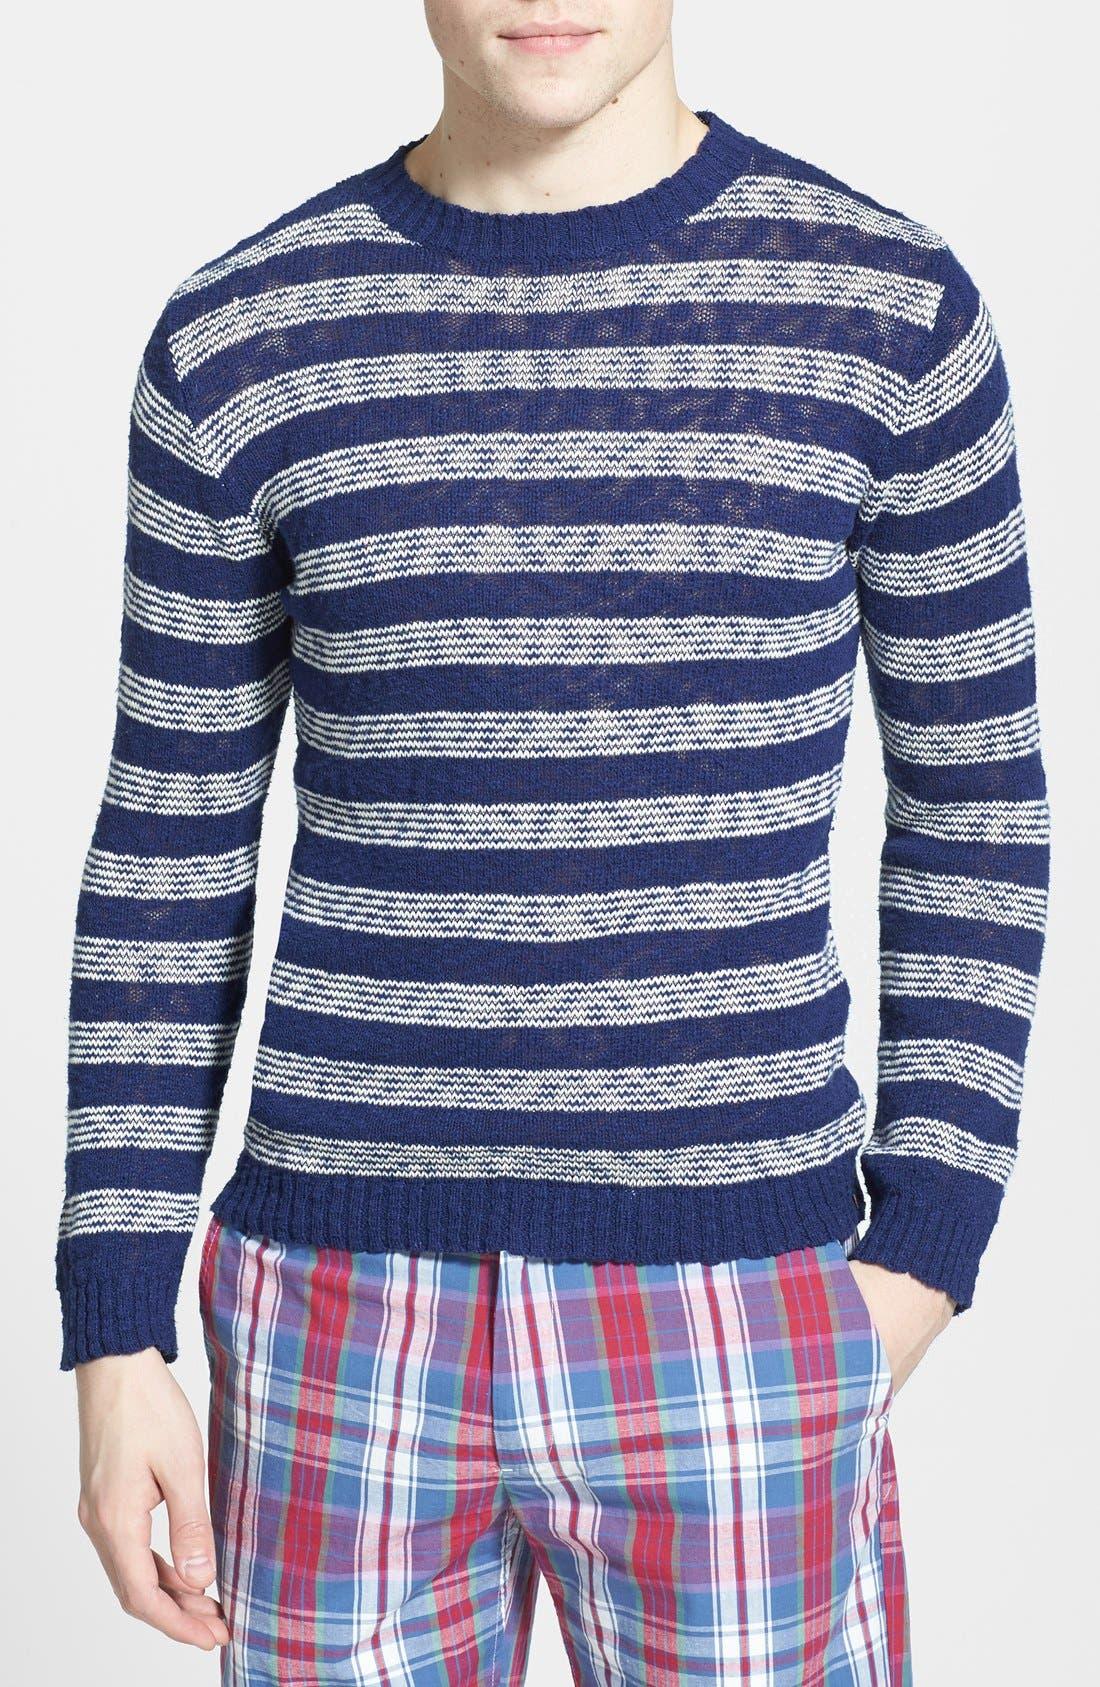 Alternate Image 1 Selected - Gant Rugger 'The Slubber' Sweater